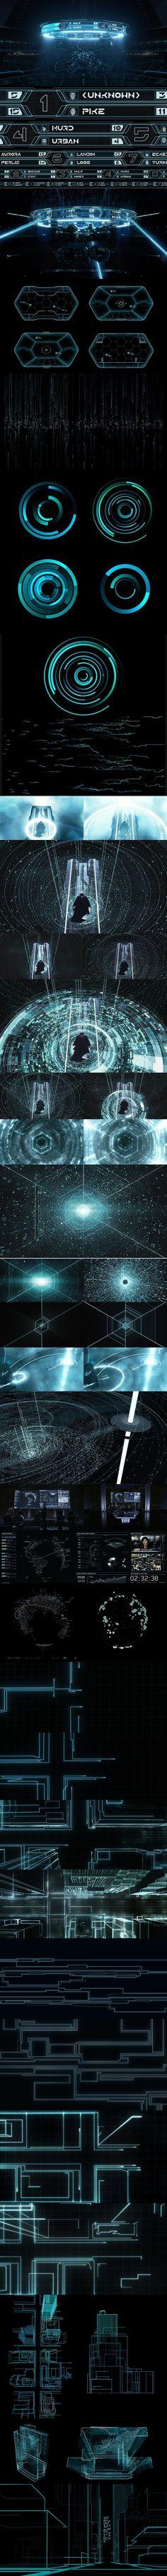 1570604afc32a83a10af05ba5ce976ba.jpg 905×13,994 pixels